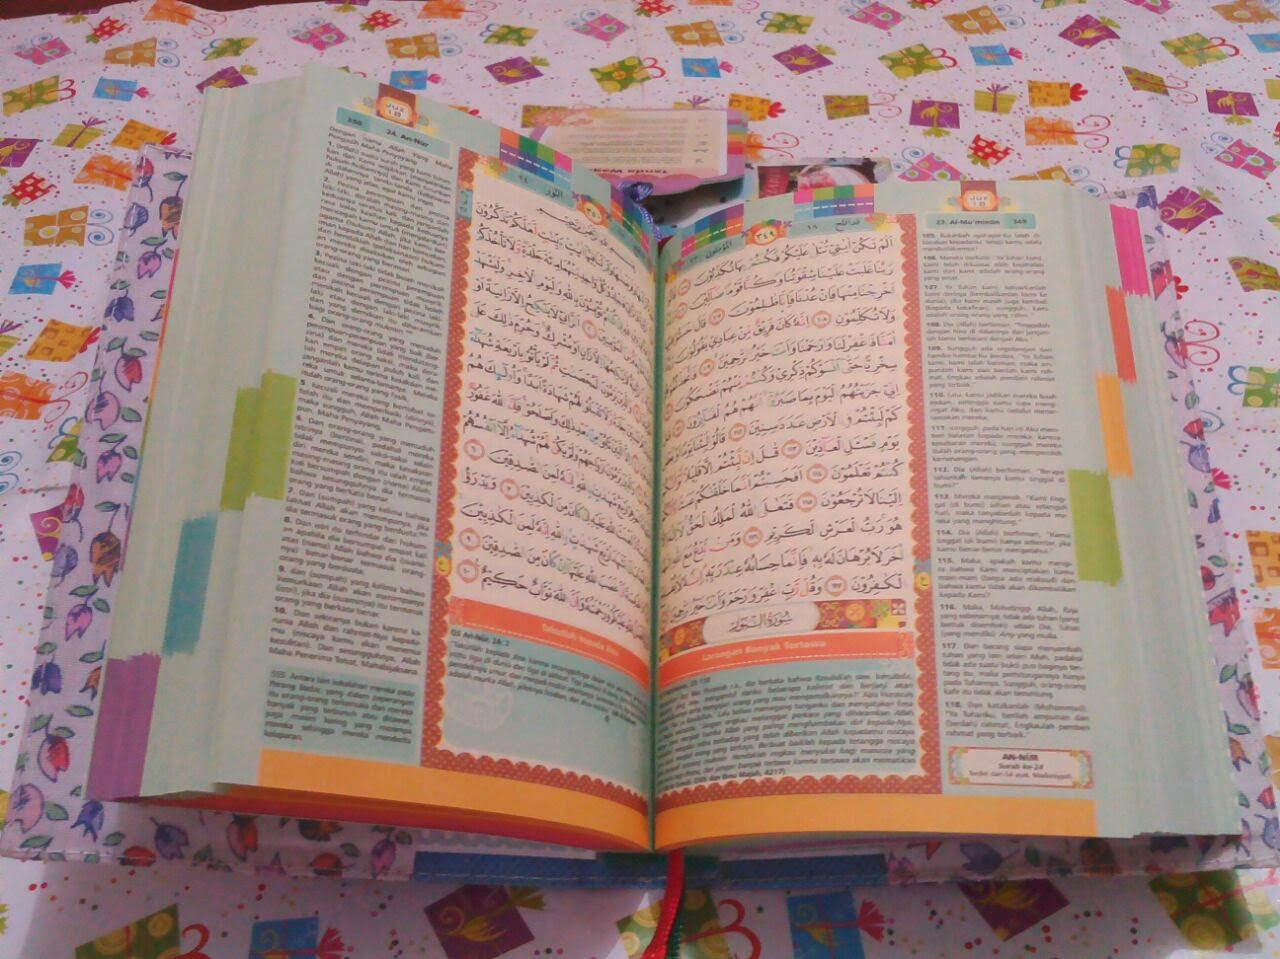 tampilan dalam al quran new madina zhafira, tampilan dalam al quran new madina zhafira rainbow, tampilan dalam al quran new madina zhafira rainbow tajwid